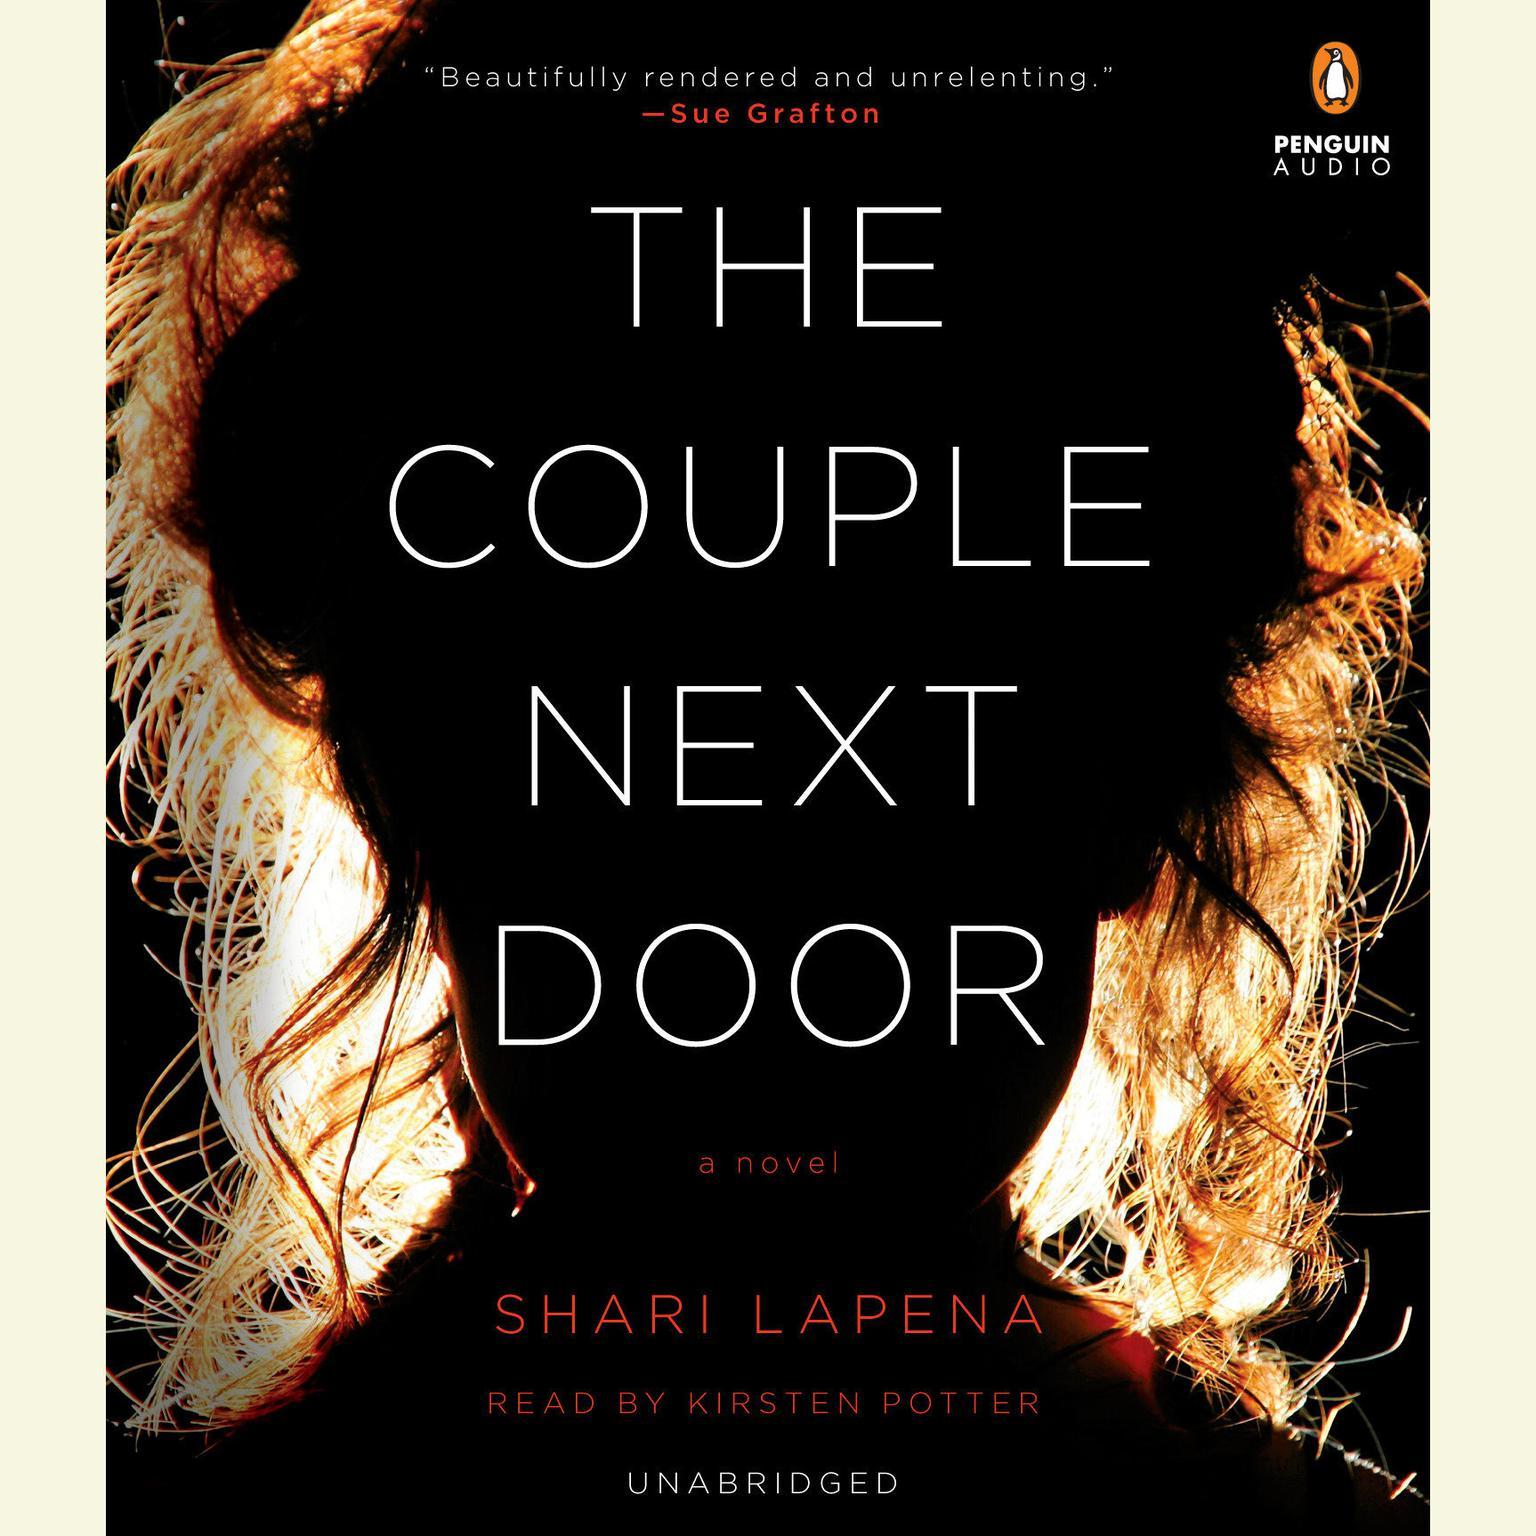 The Couple Next Door: A Novel Audiobook, by Shari Lapena